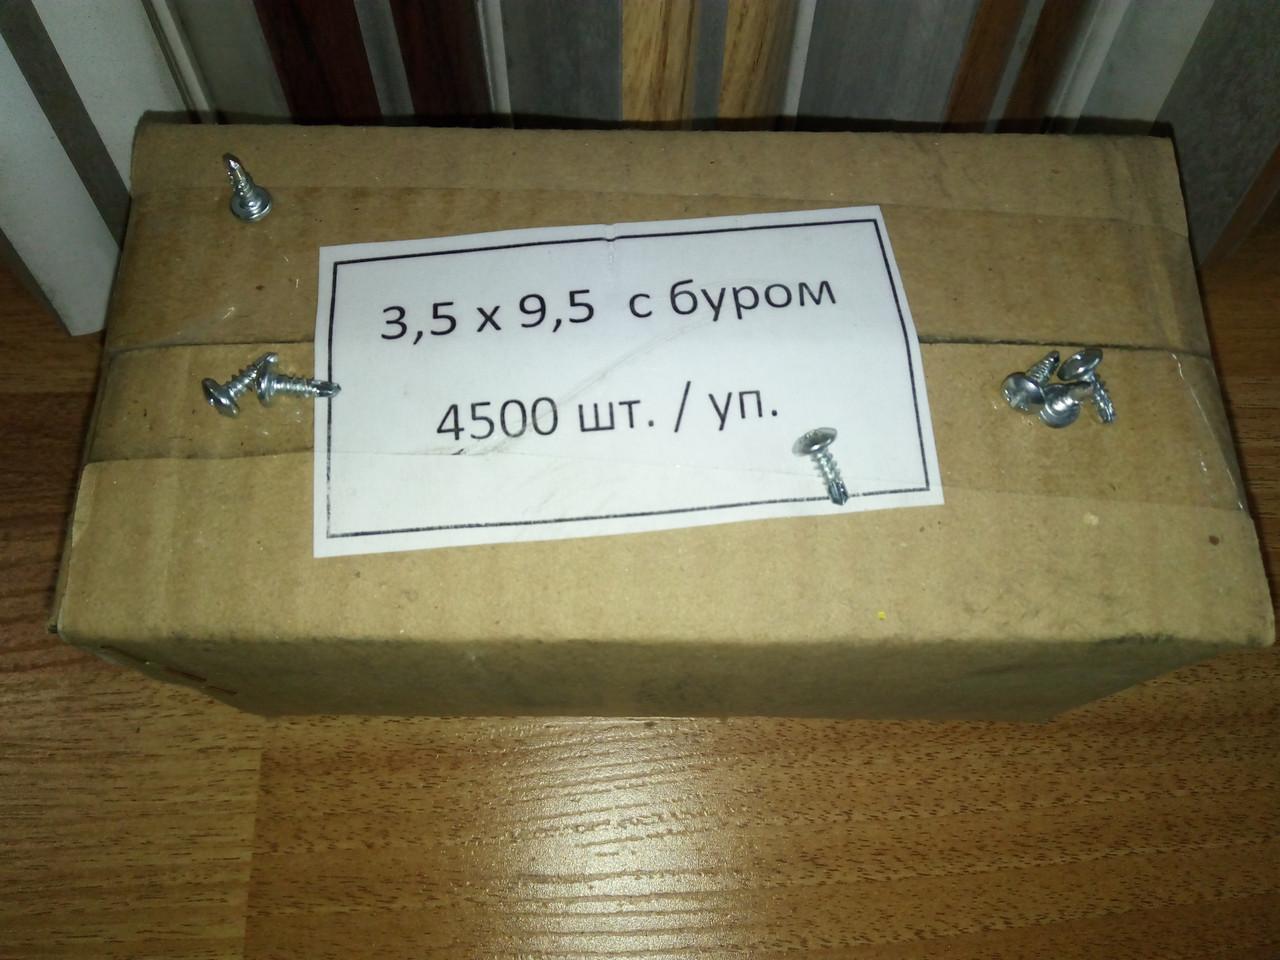 Саморезы с буром 3,5х9,5 мм, 4,5 тыс/упак , блоха , текс